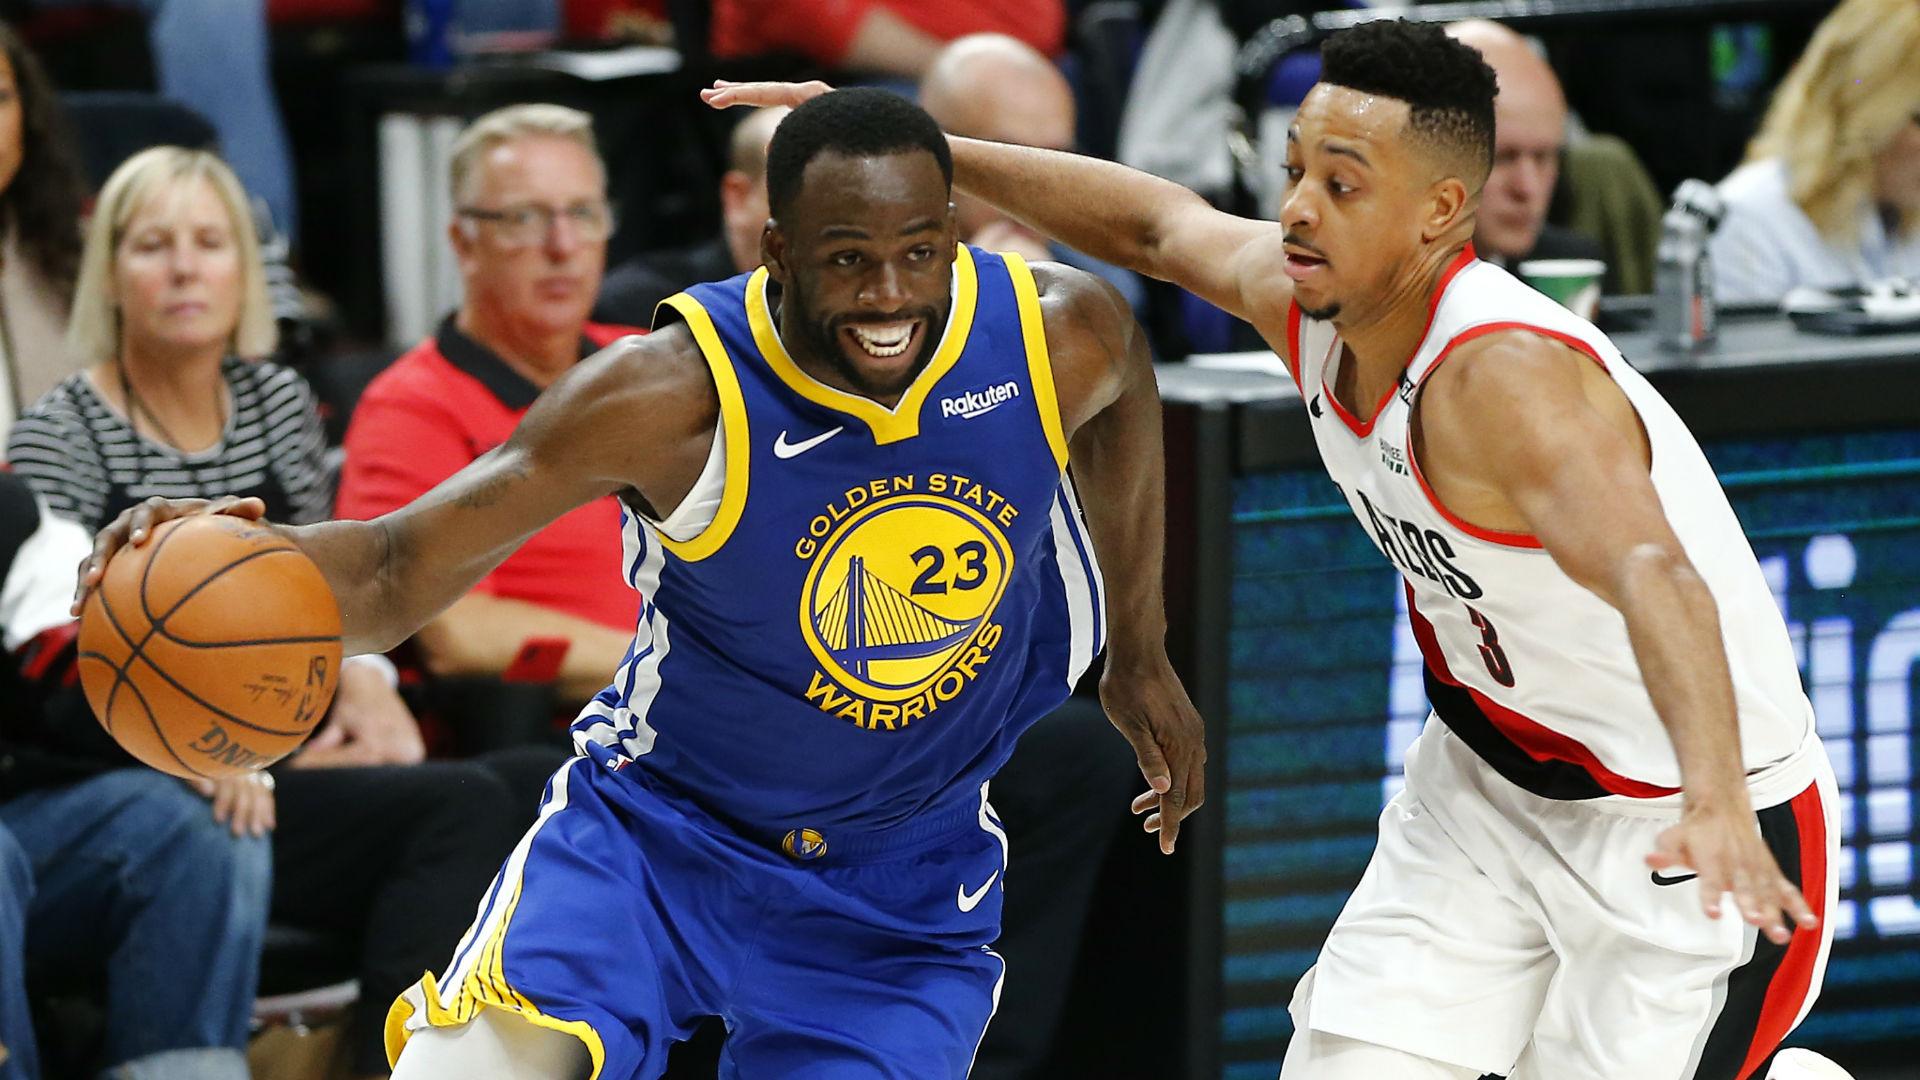 NBA Playoffs 2019: Portland Trail Blazers Vs. Golden State